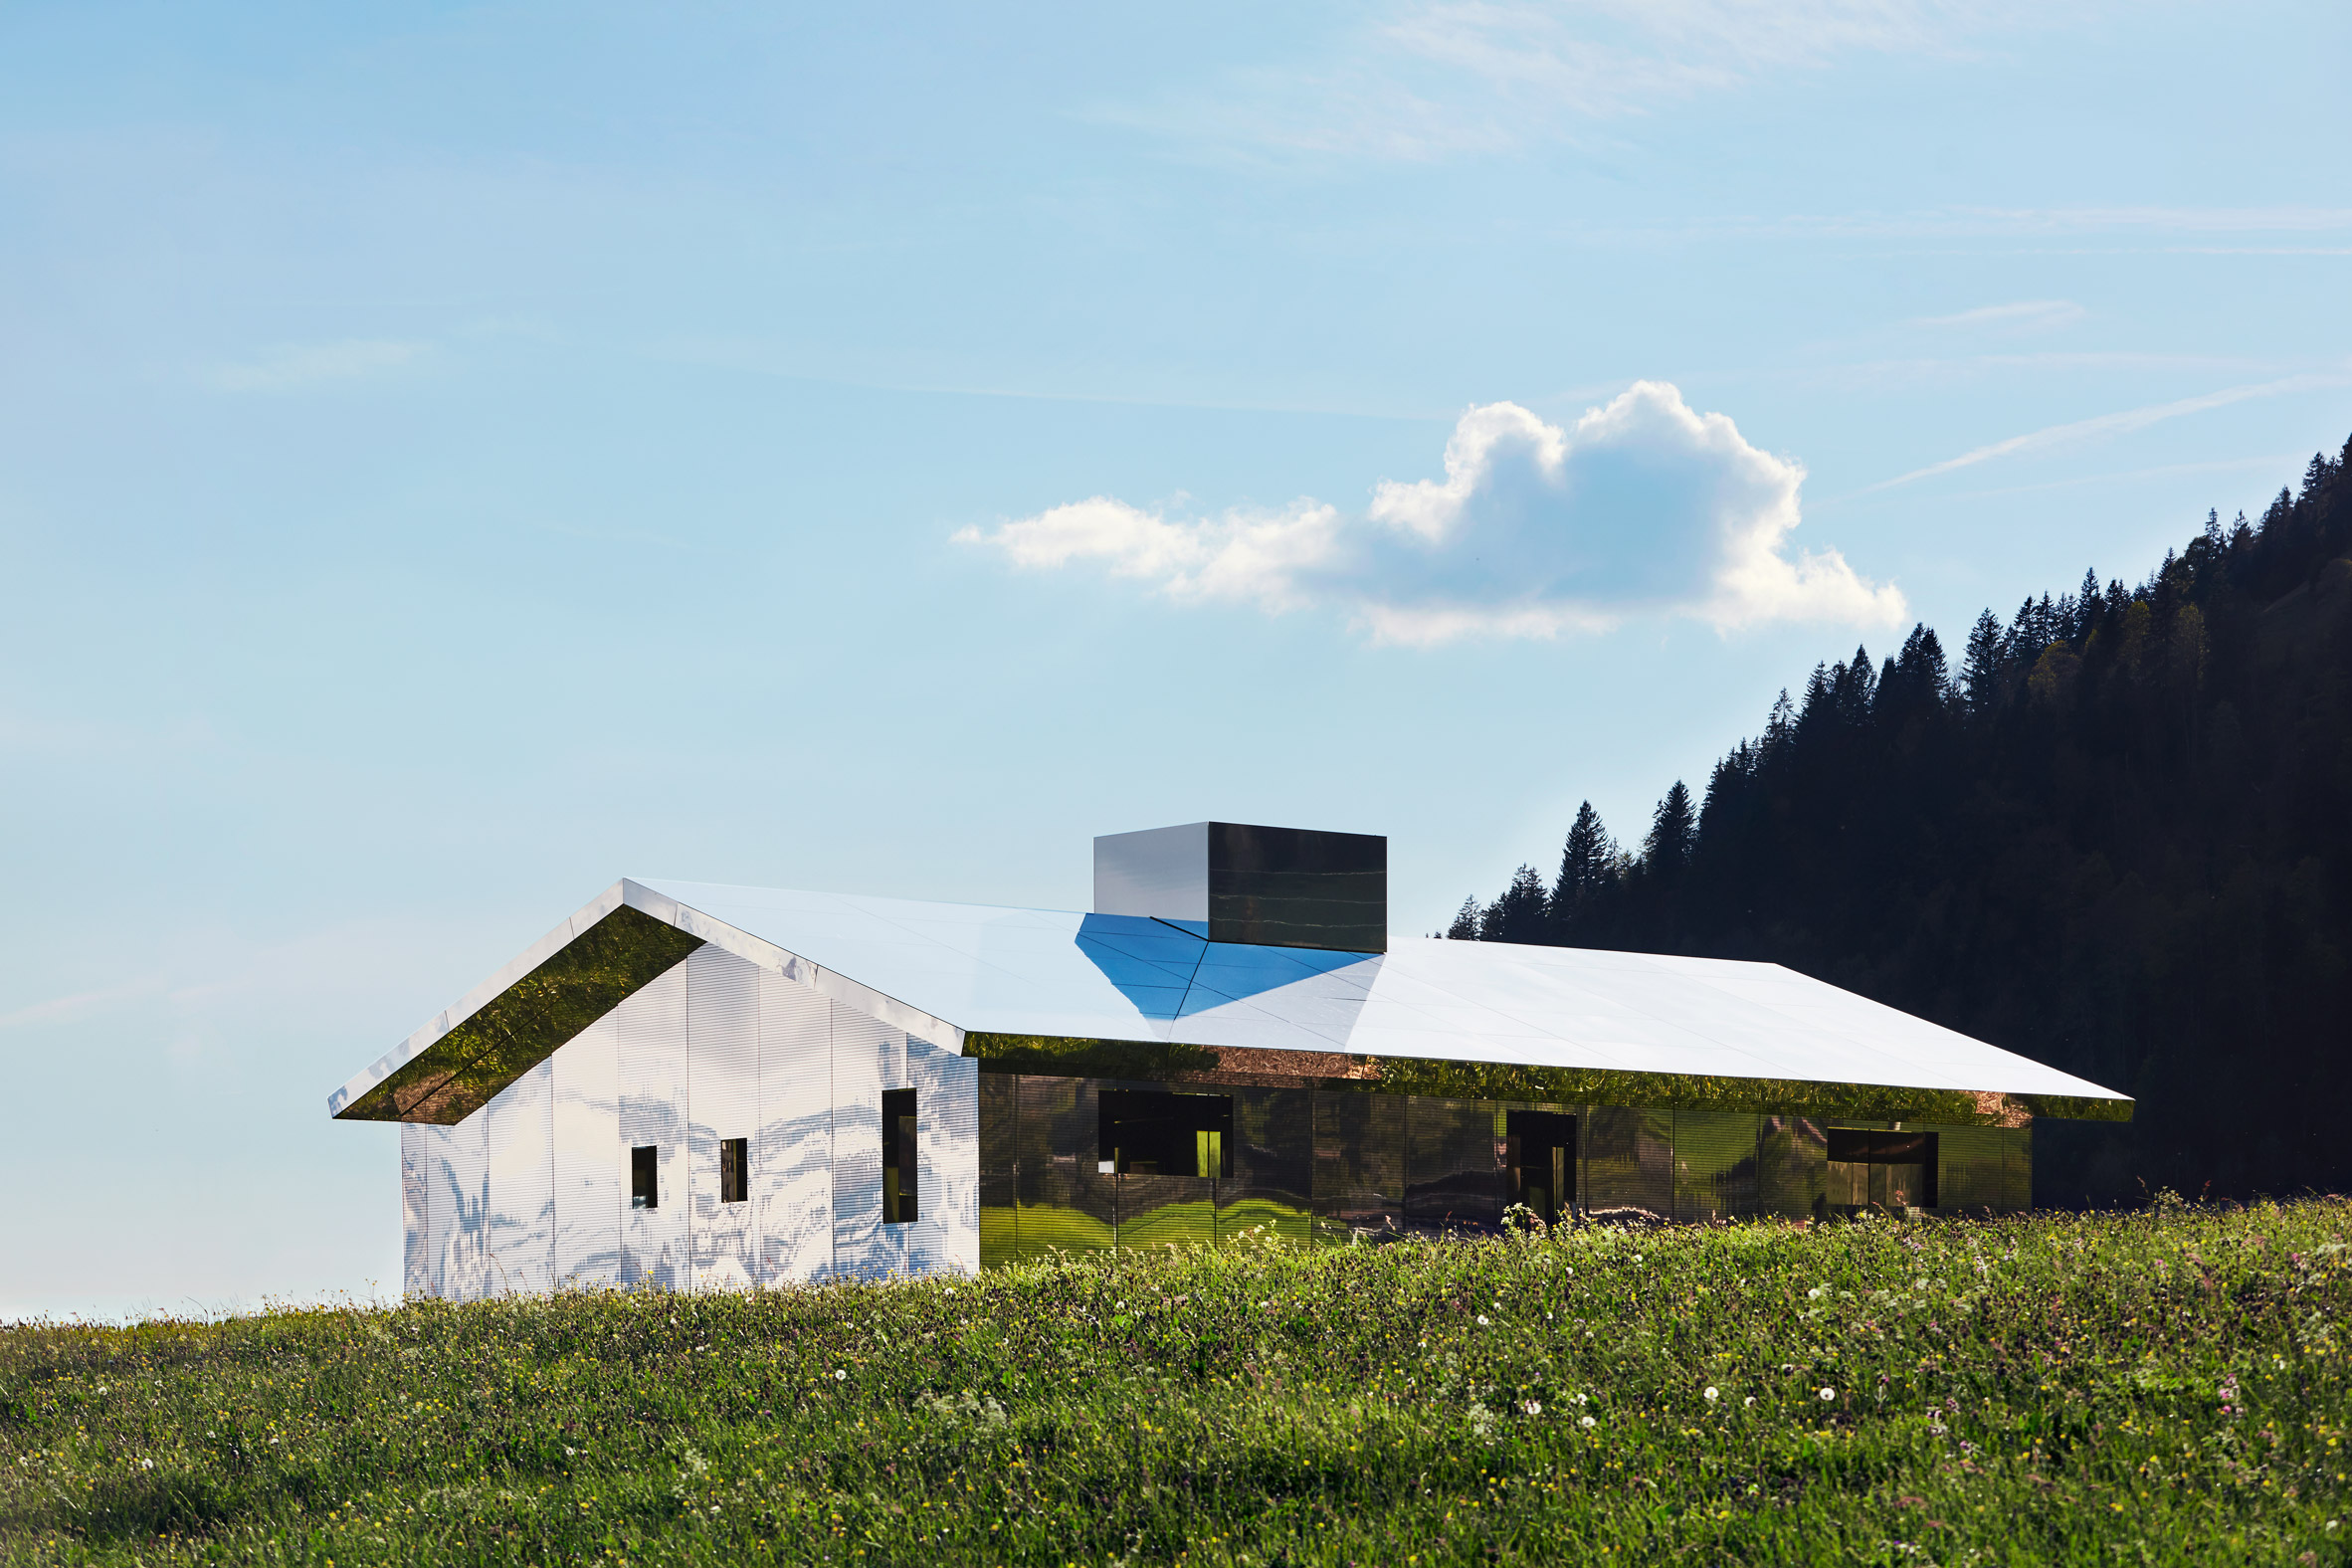 Mirage Gstaad mirrored building art installation by Doug Aitken in Switzerland in summer